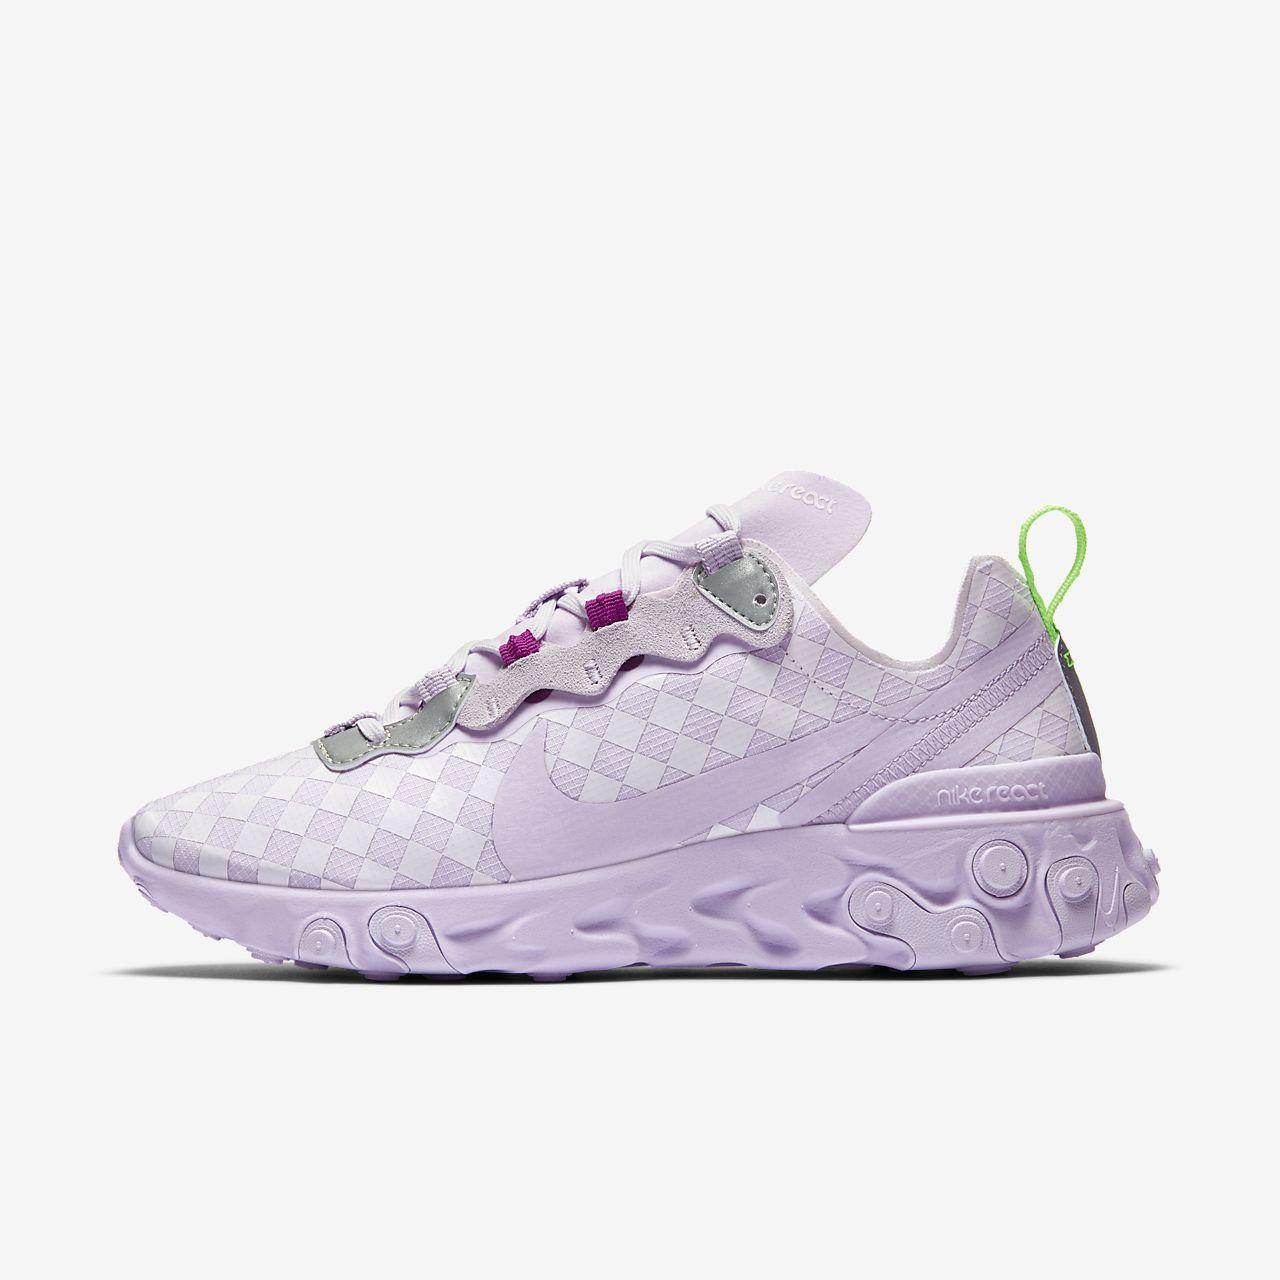 Nike React Element 55 Women's Chequered Shoe